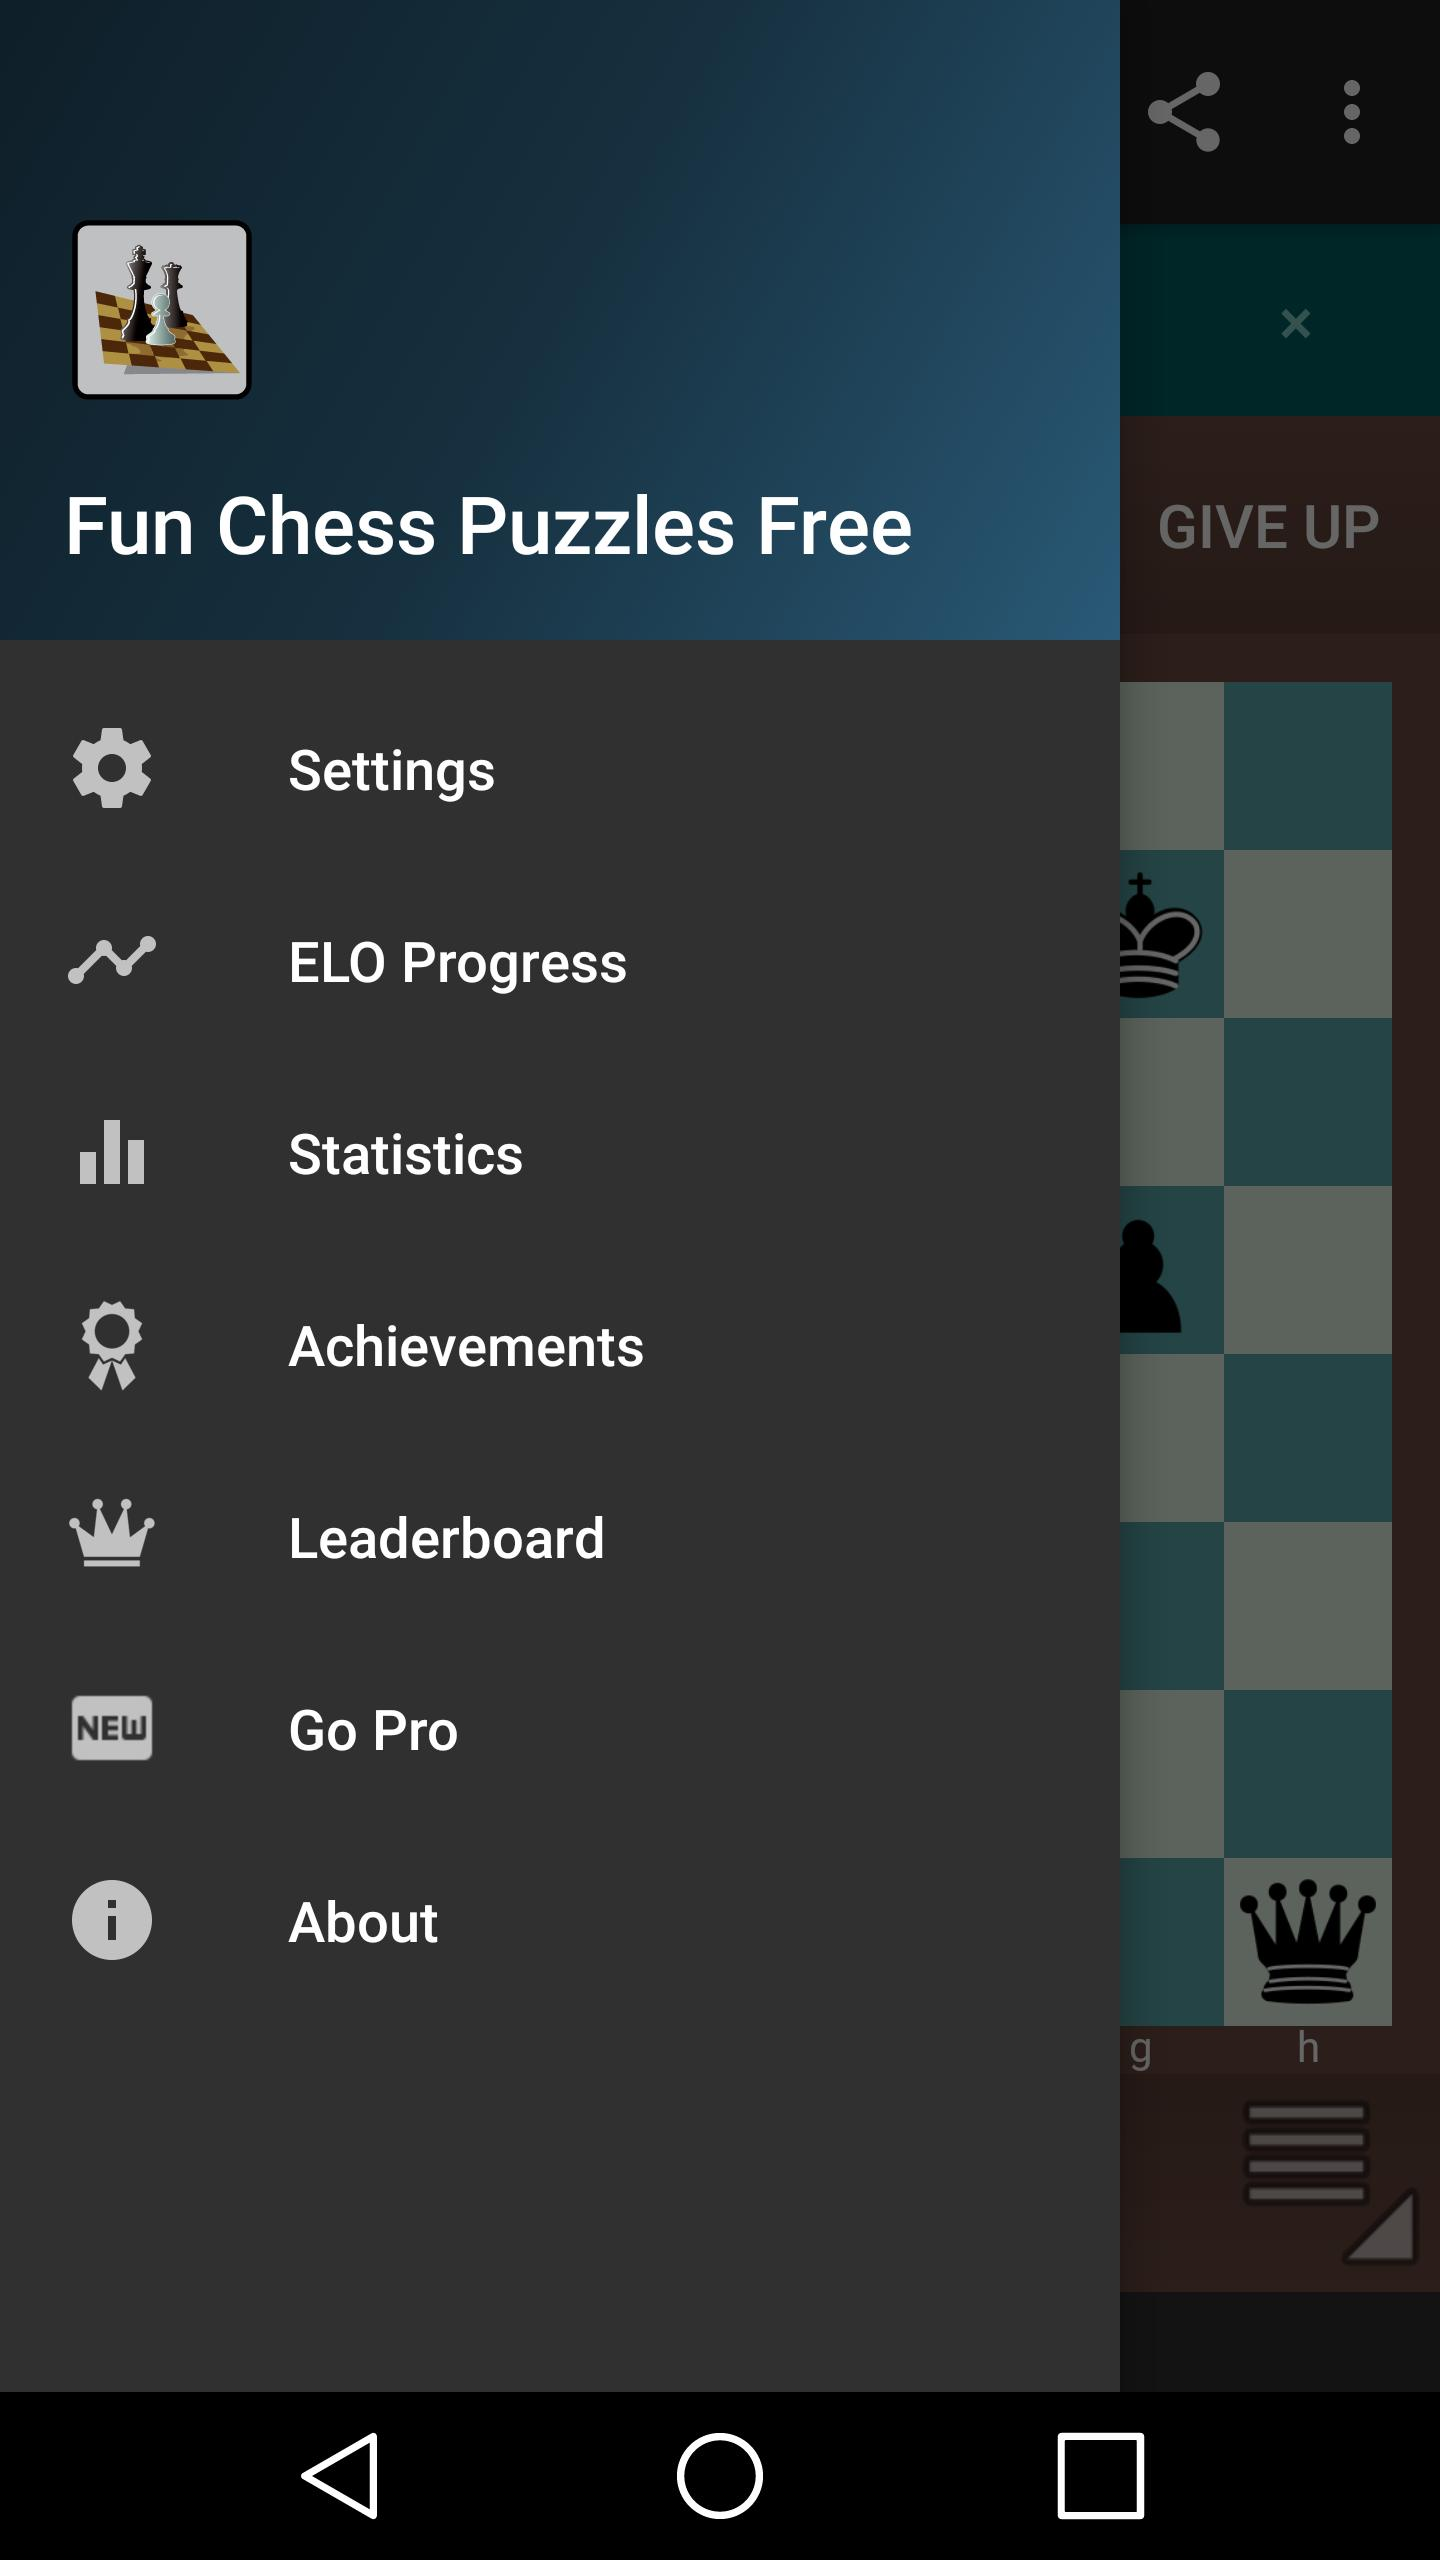 Fun Chess Puzzles Free Play Chess Tactics 2.8.3 Screenshot 8